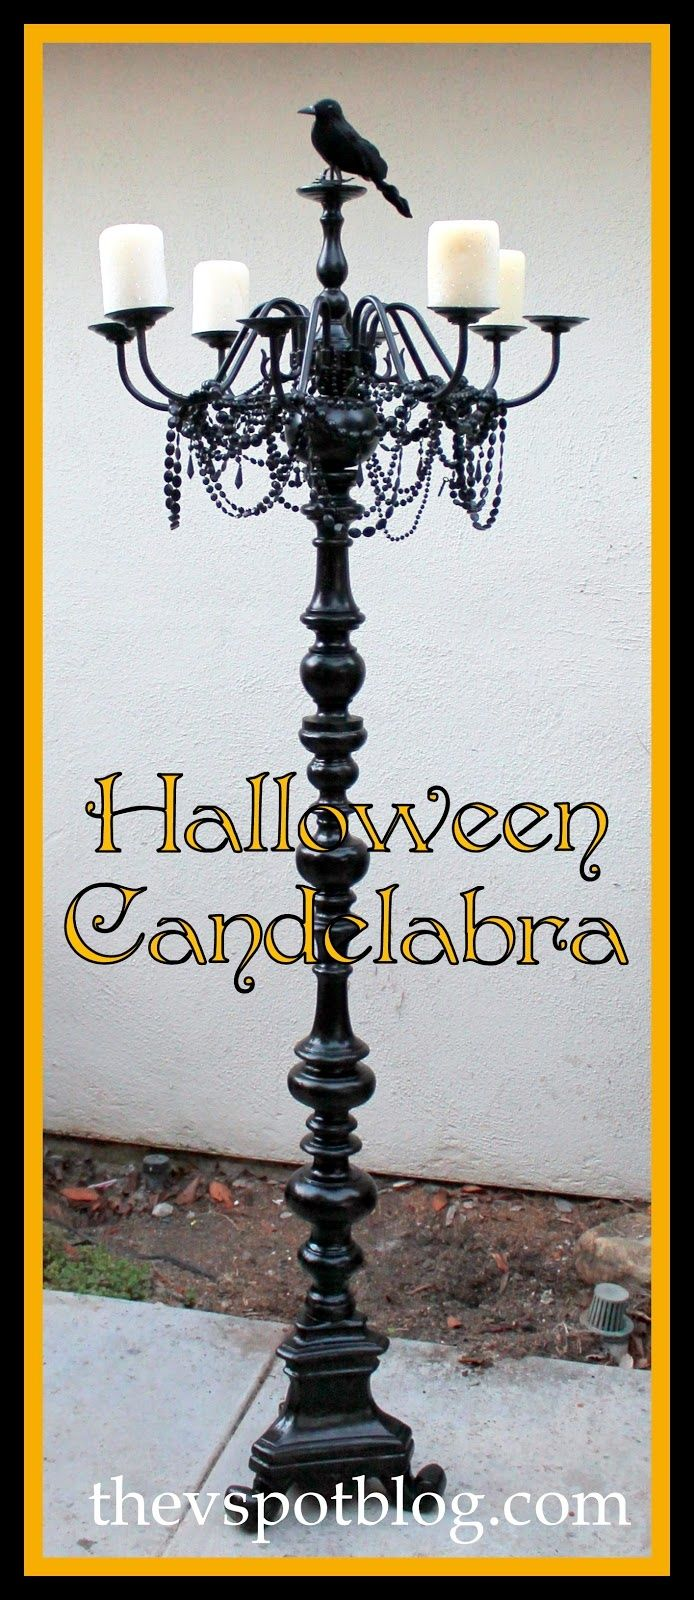 A floor Candelabra for Halloween.